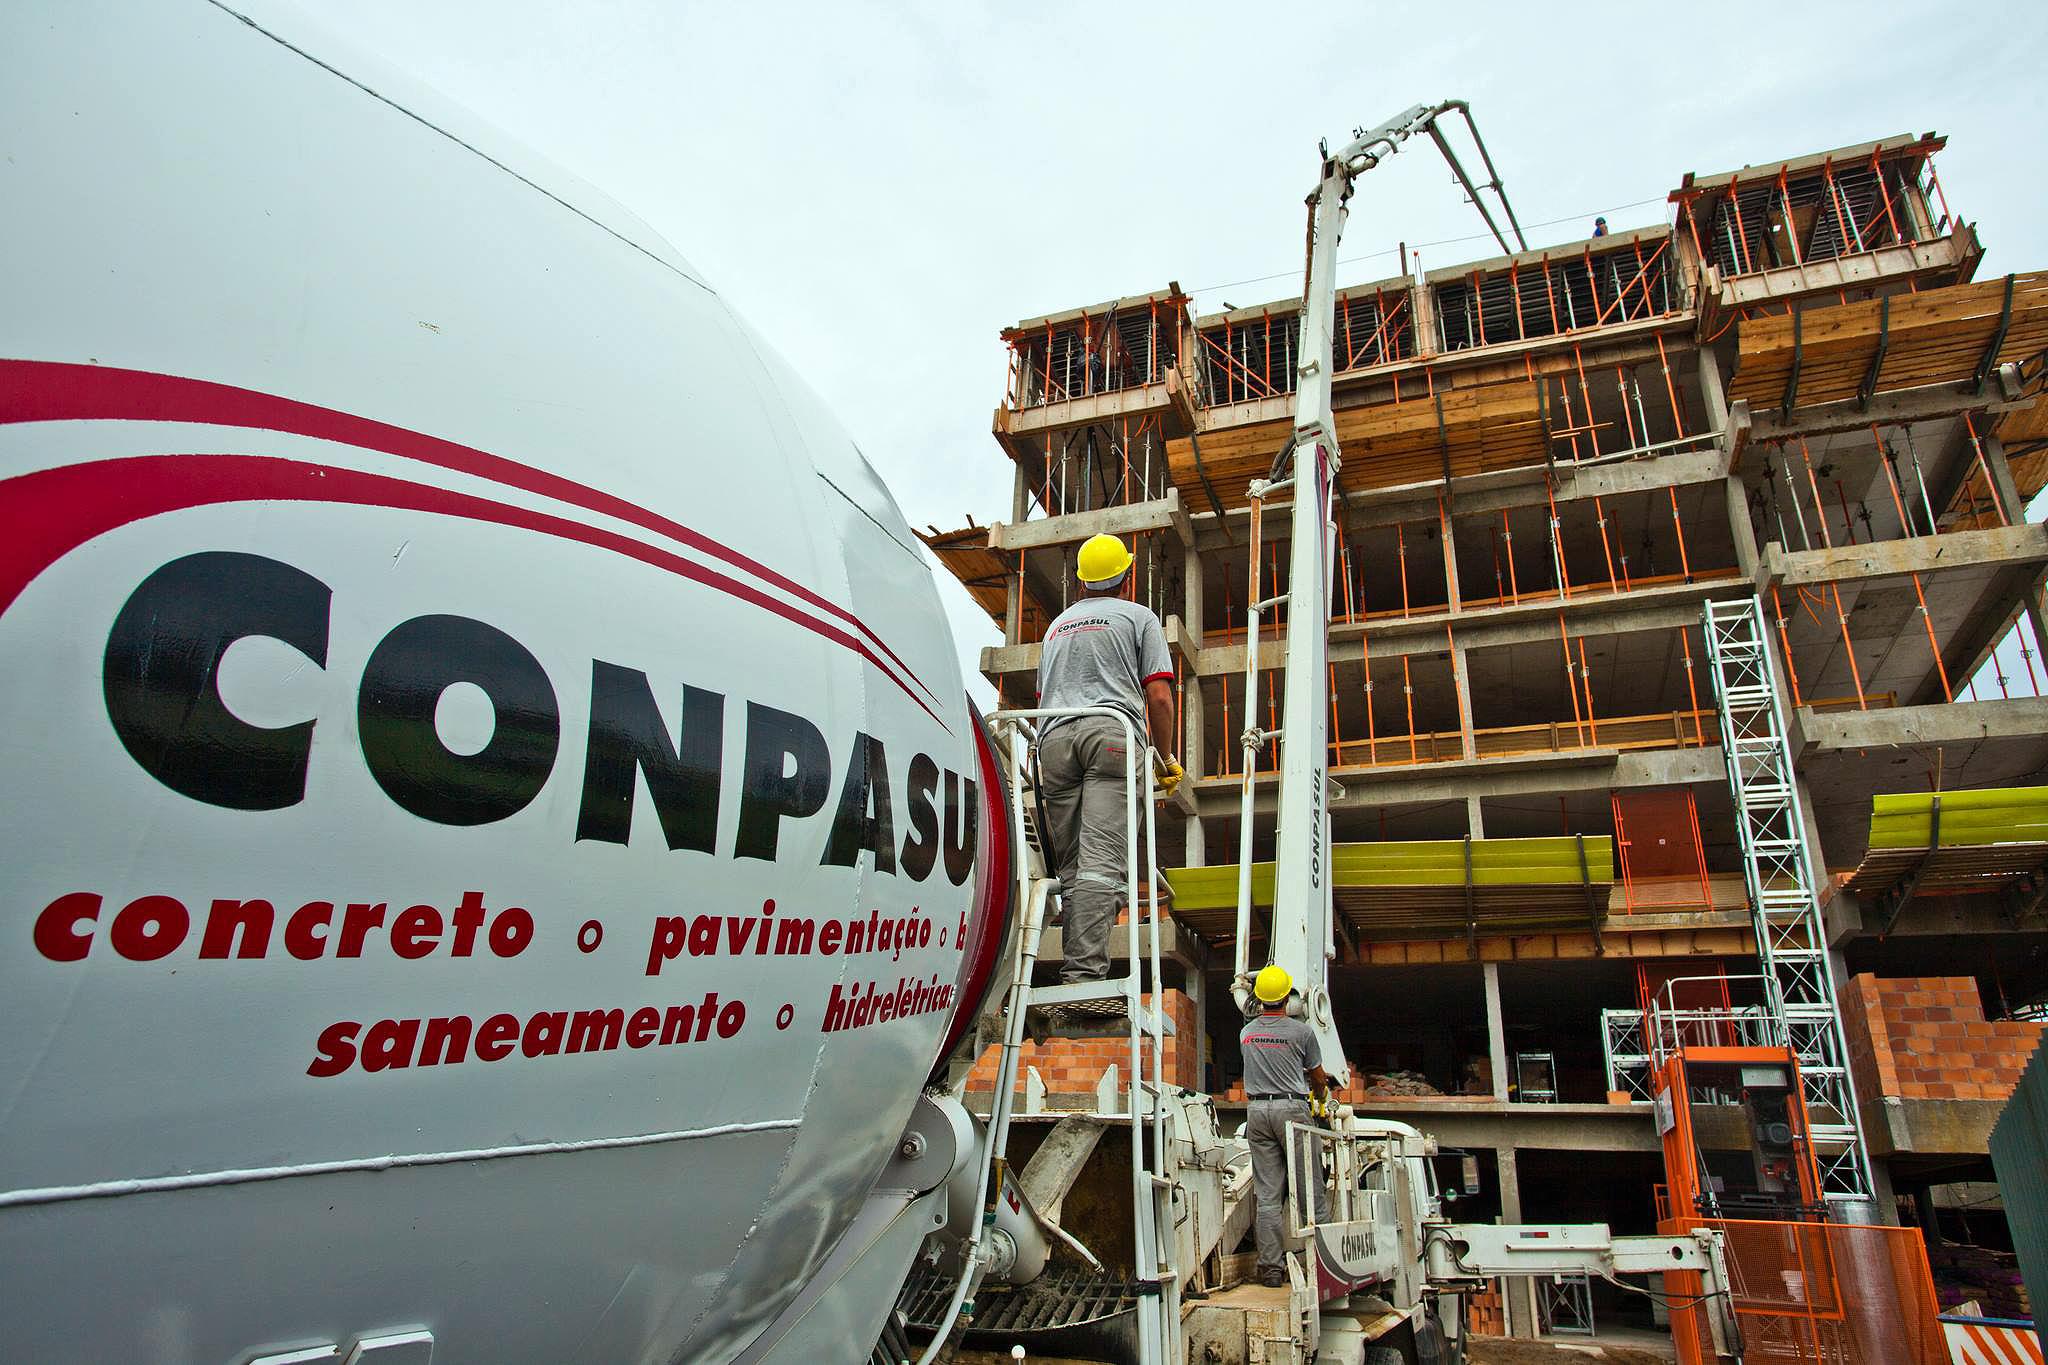 Na Conpasul, a tecnologia está presente também nos equipamentos que entregam o concreto ao cliente